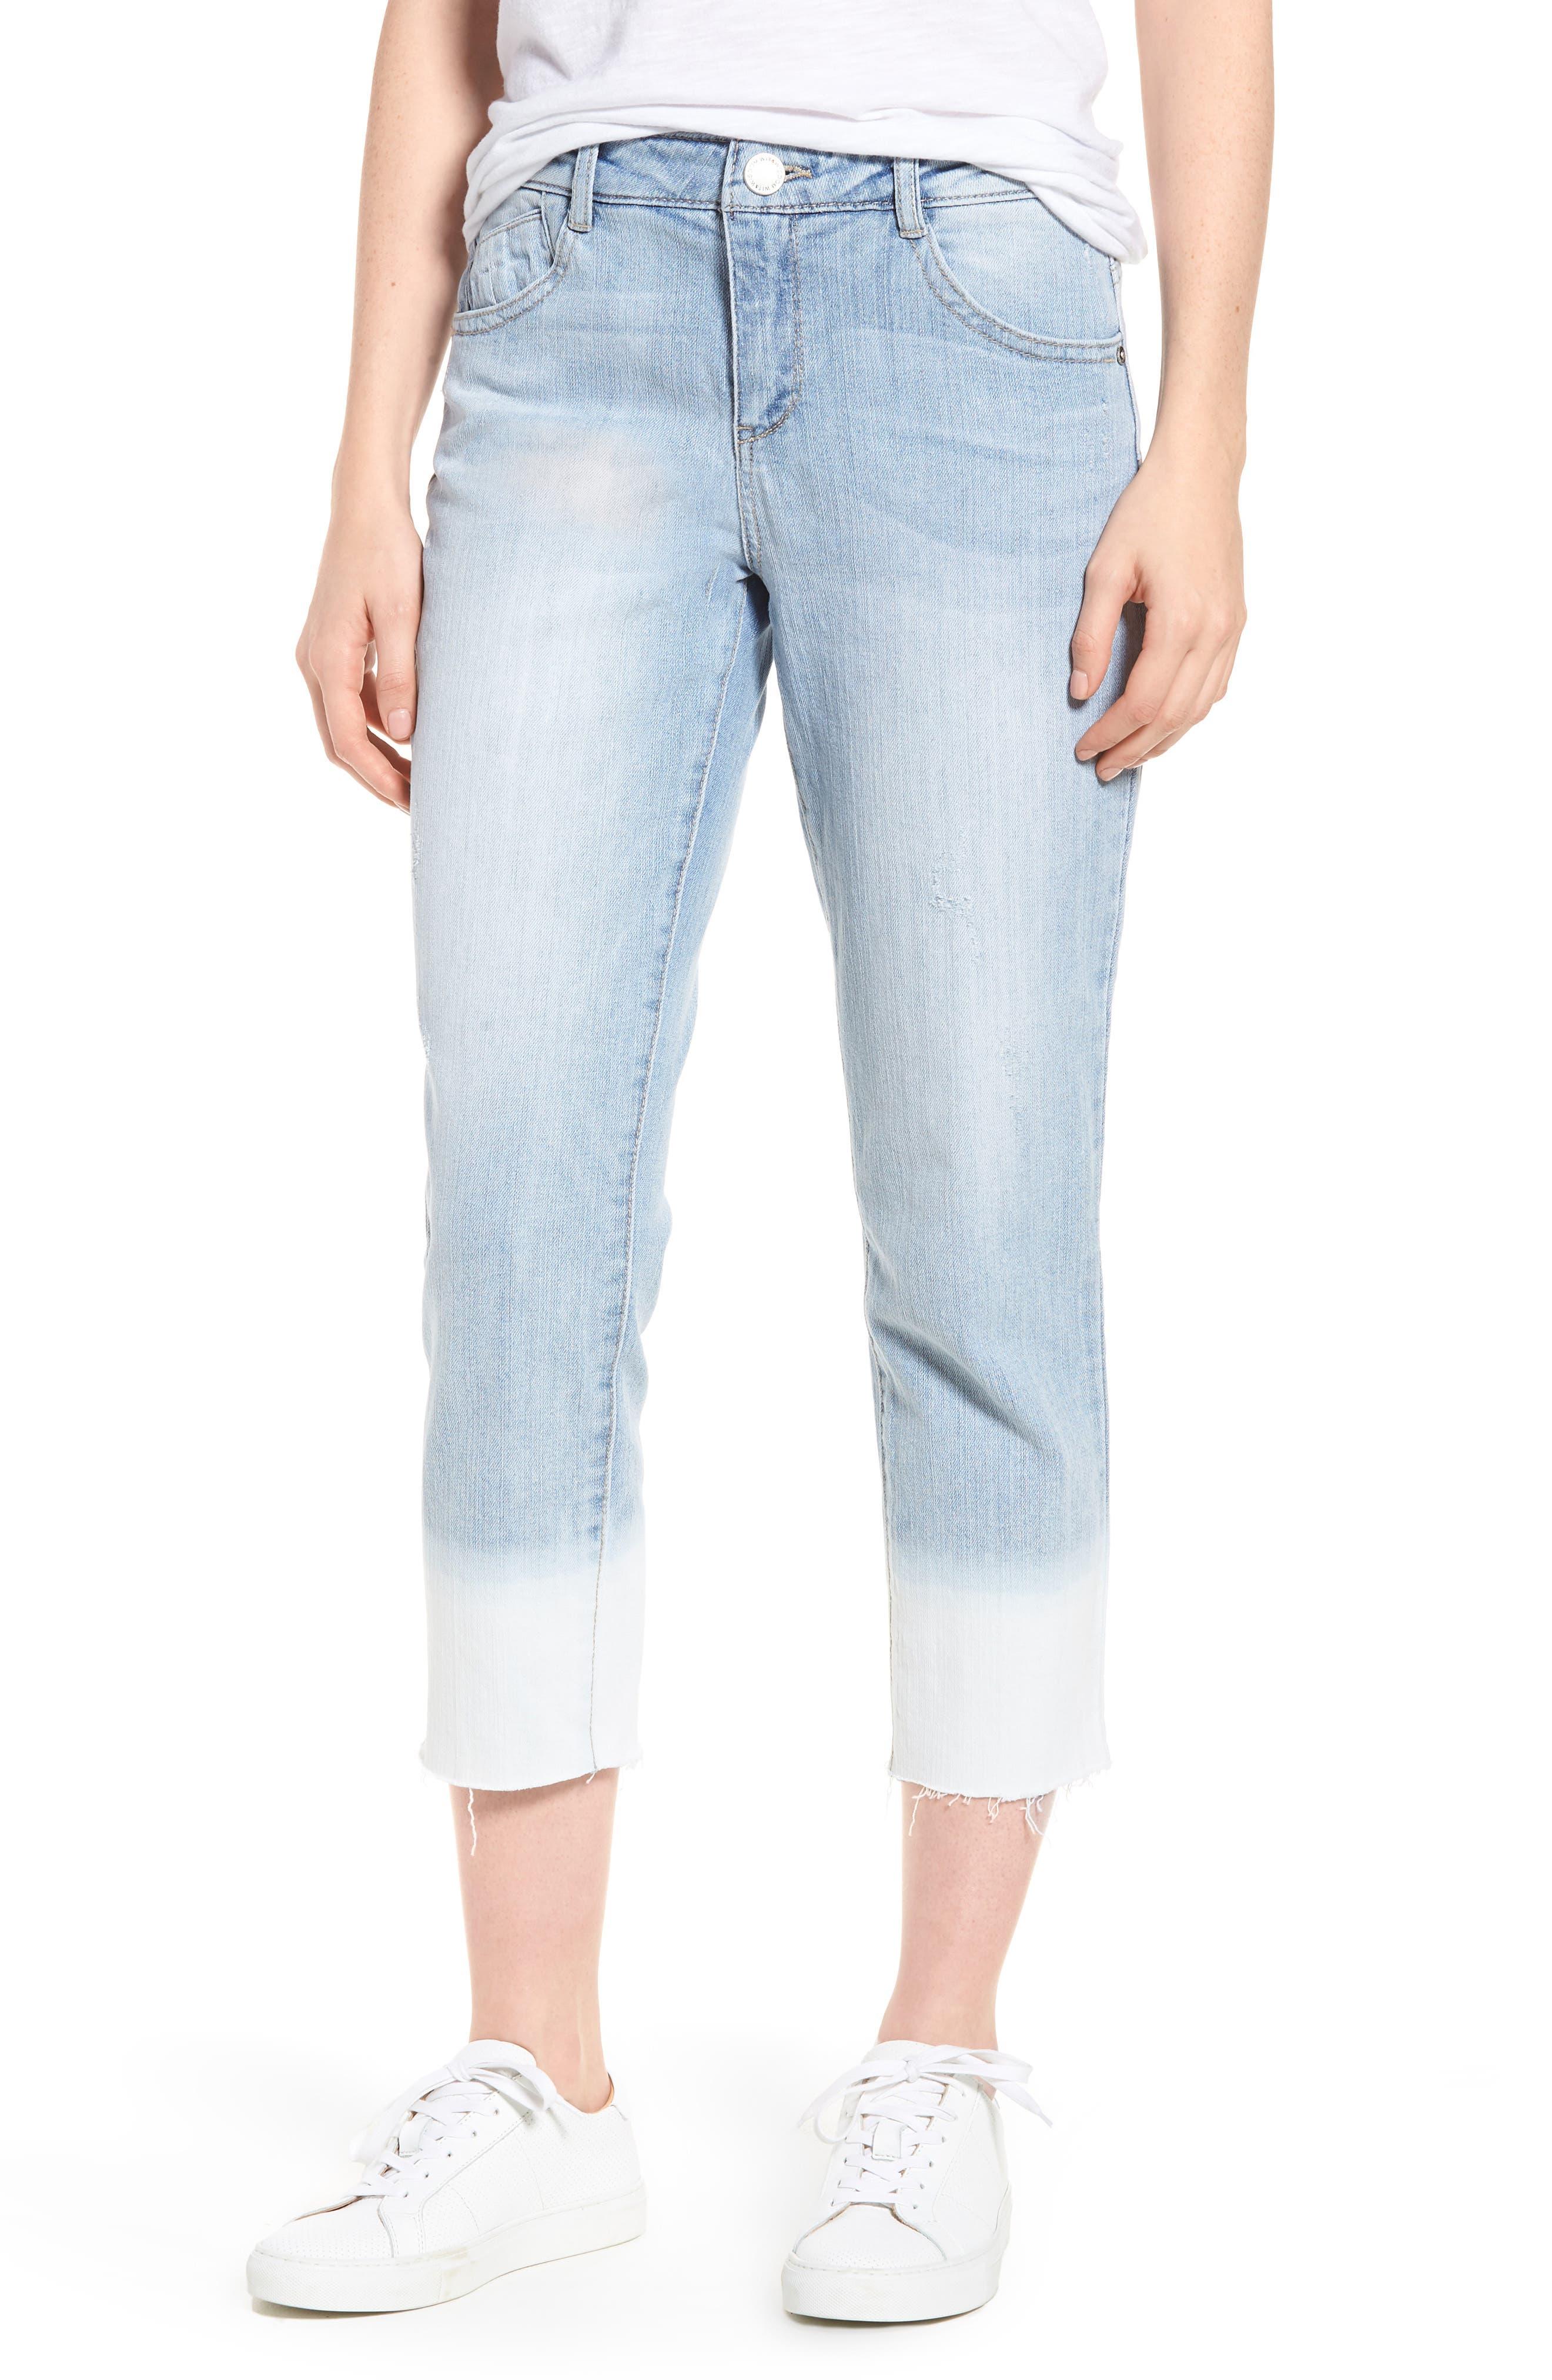 Wit & Wisdom Flex-Ellent Bleached Raw Hem Jeans (Nordstrom Exclusive)